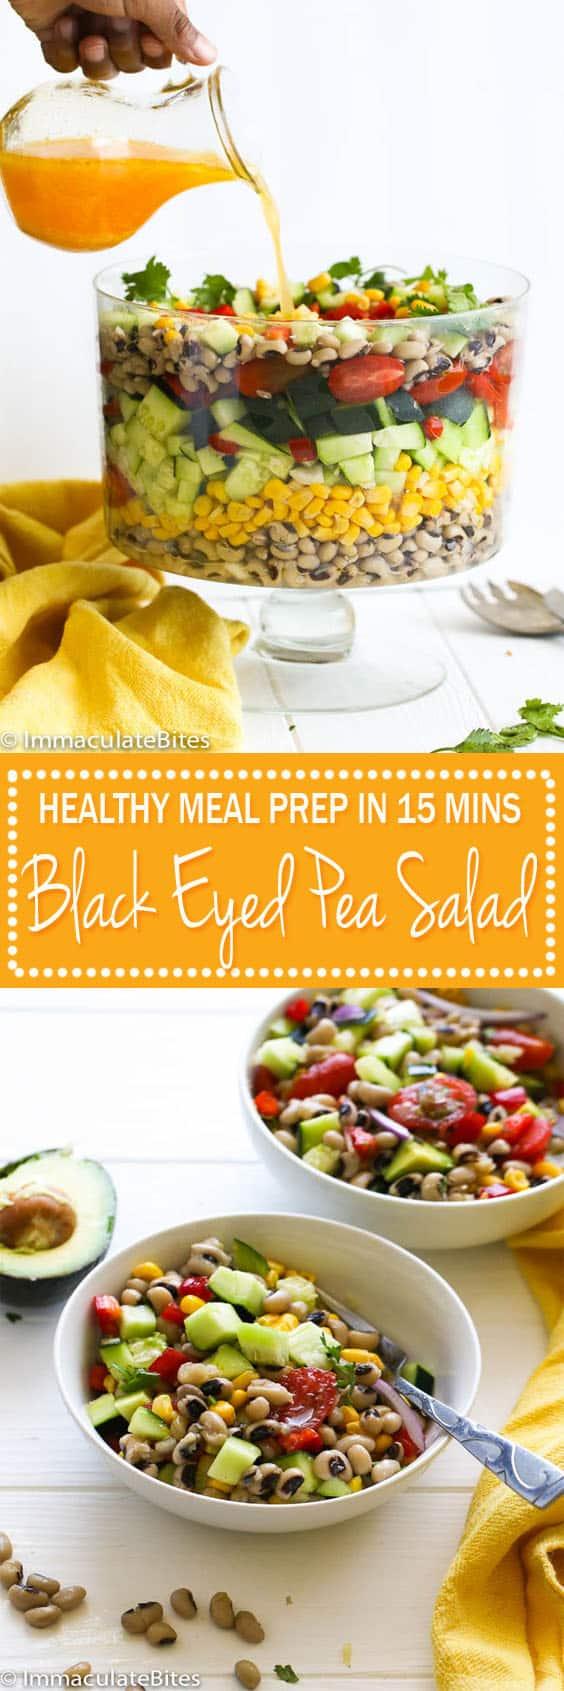 http://www.africanbites.com/wp-content/uploads/2017/06/black-eyed-pea-salad-2